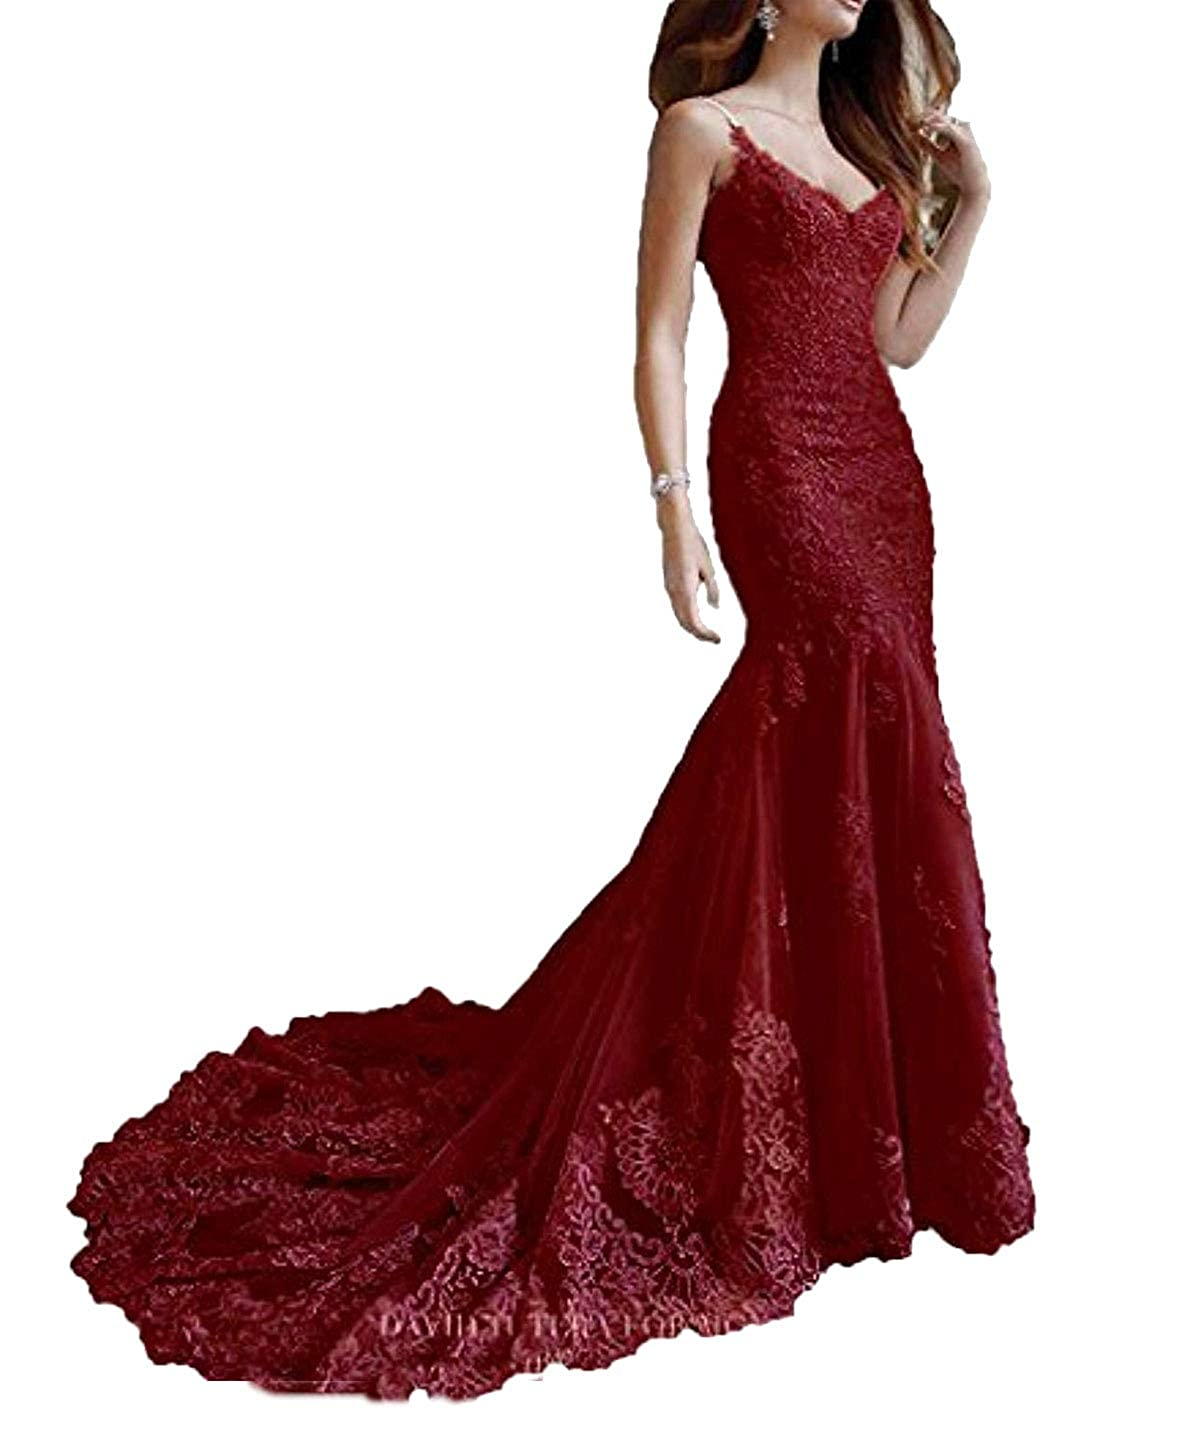 Burgundy Marirobe Women's Mermaid Lace Applique Formal Dresses V Neck Backless Wedding Dresses Sleeveless Evening Dresses